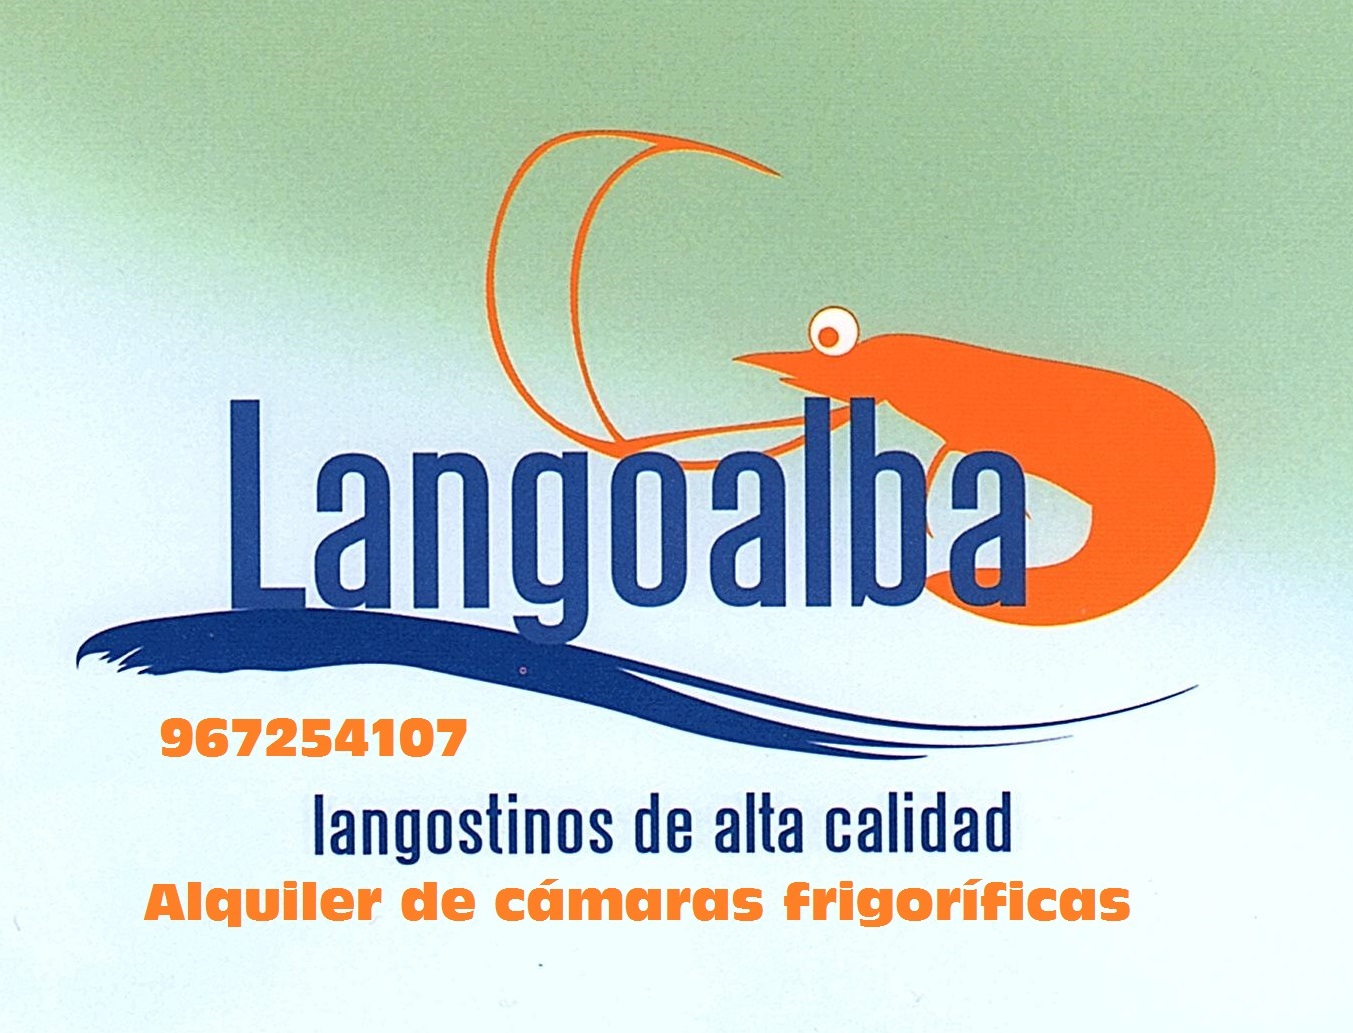 langoalba logo